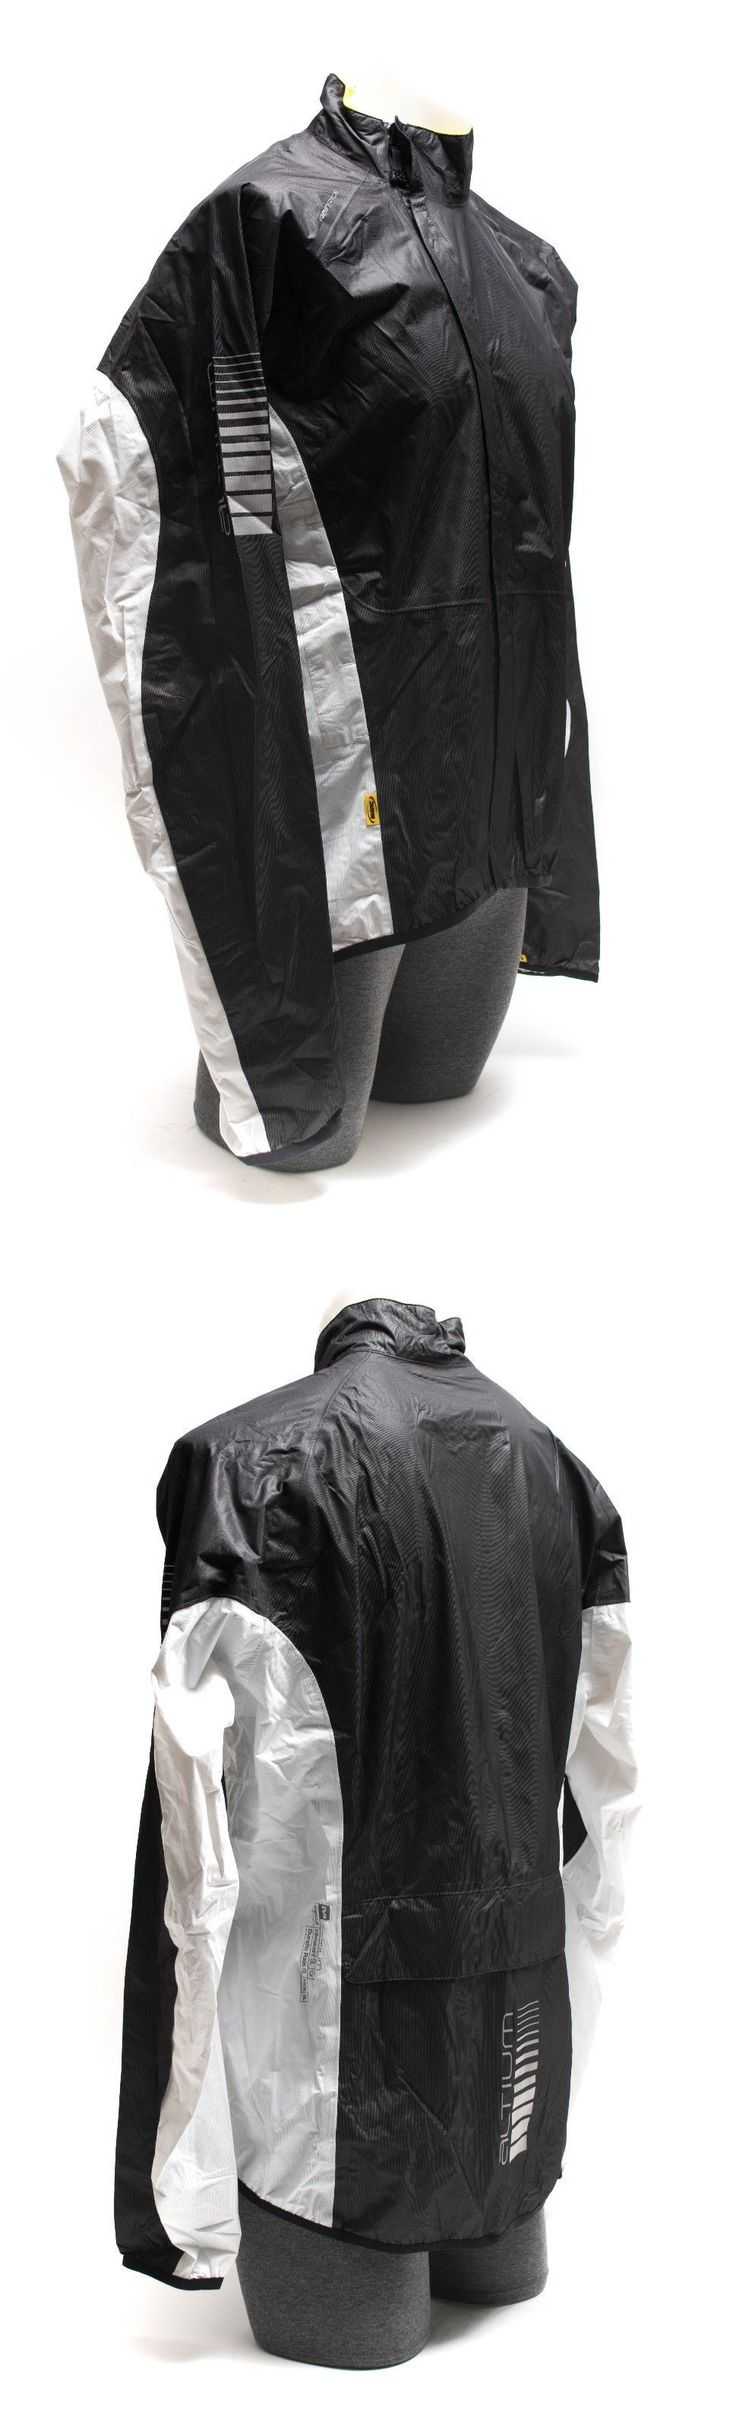 Jackets 36124: Mavic Helium H2o Men Road Mountain Bike Cycling Lightweight Wind Rain Jacket Xl -> BUY IT NOW ONLY: $49.95 on eBay!